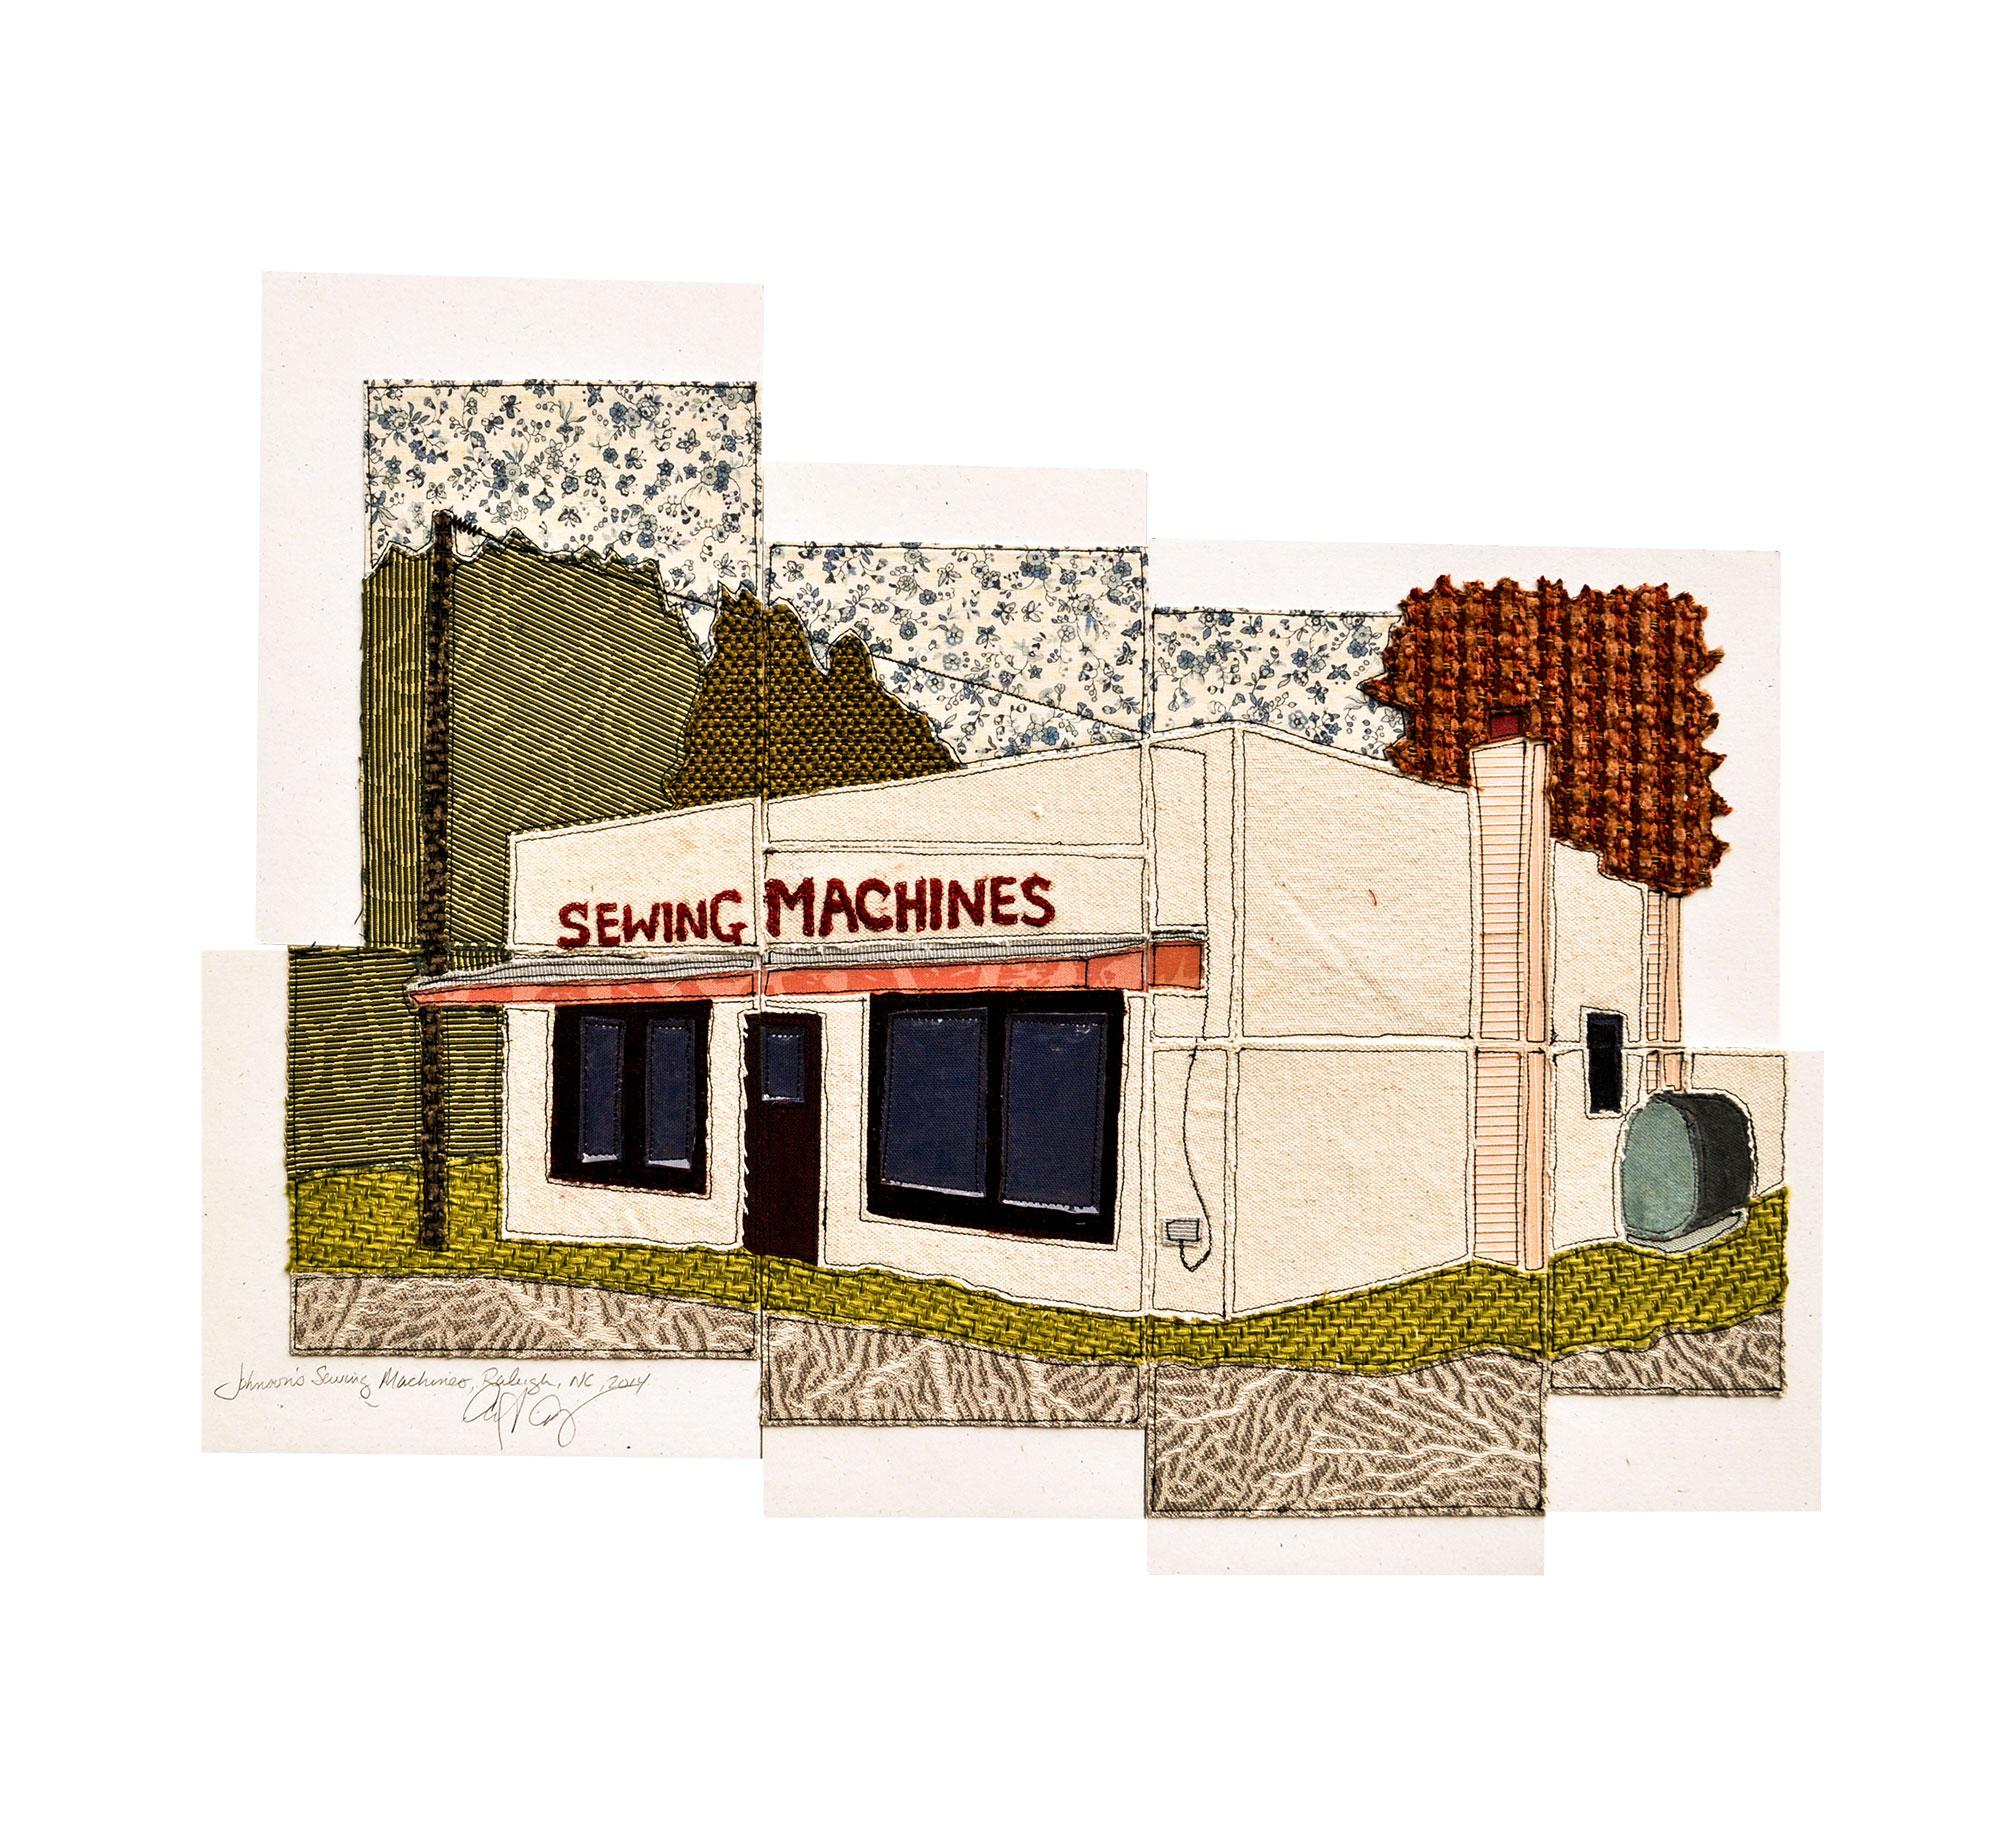 Johnson Sewing Machines, Raleigh, NC, 2014